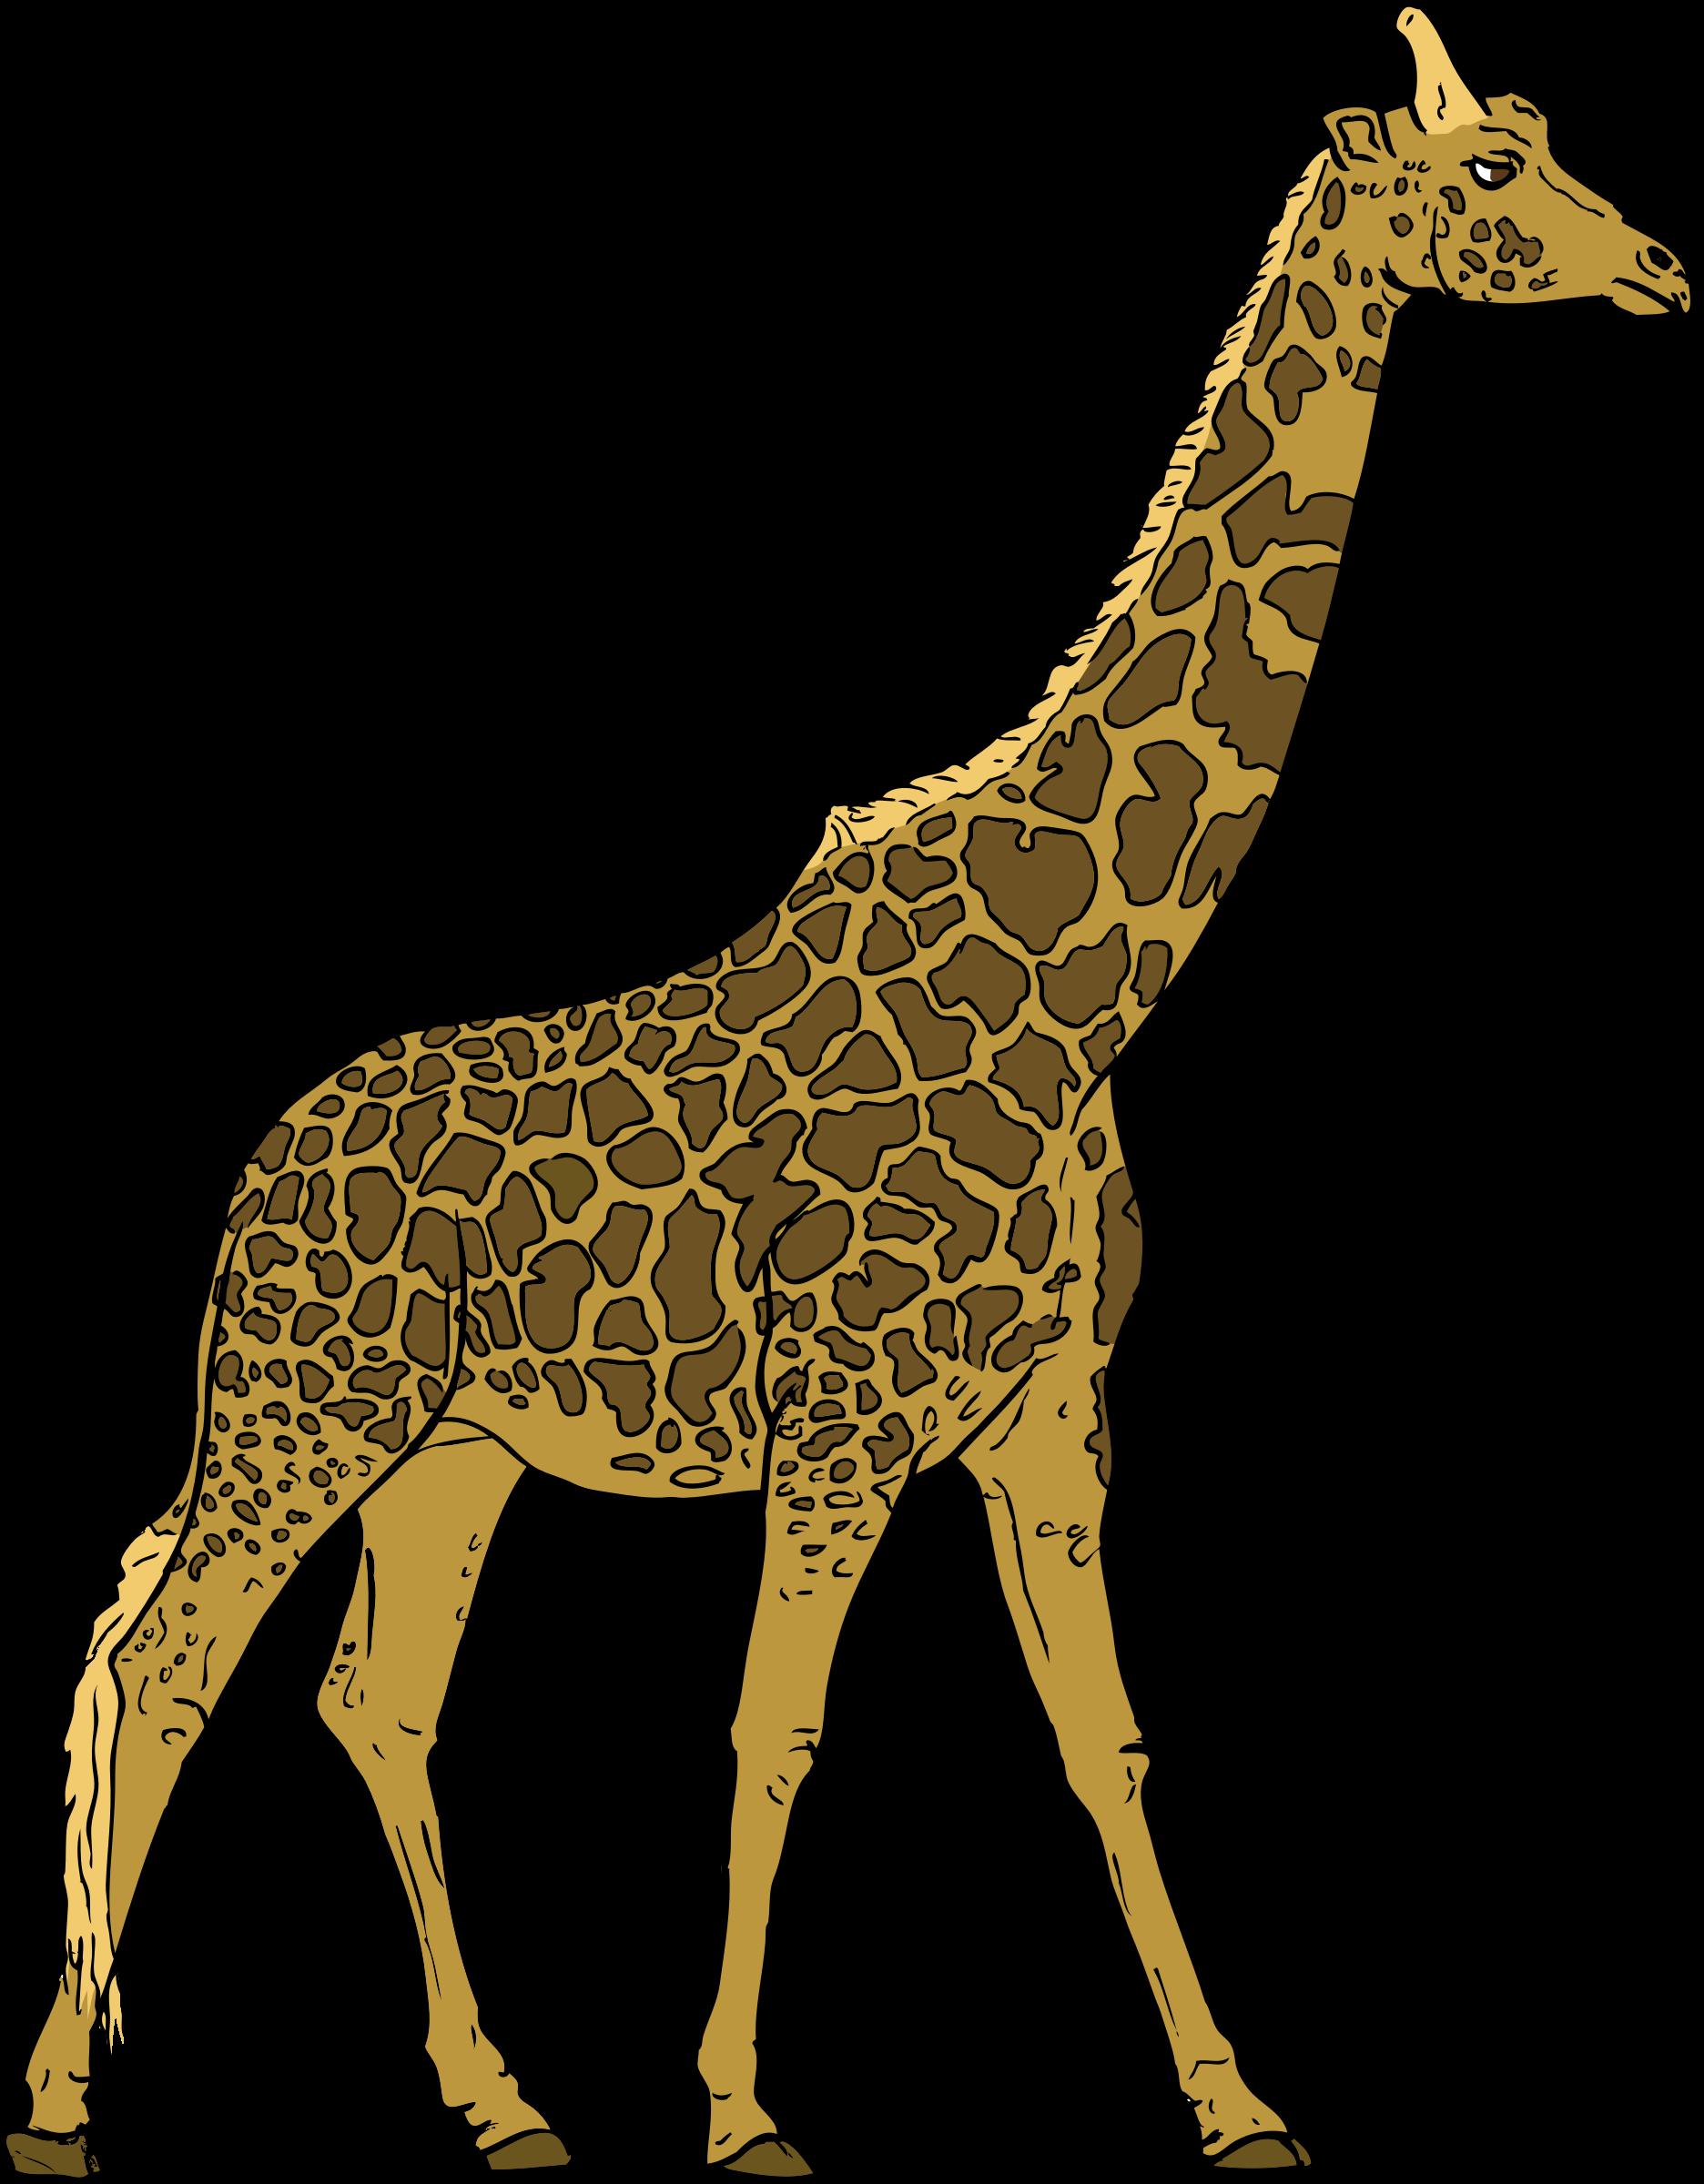 Clipart - Giraffe